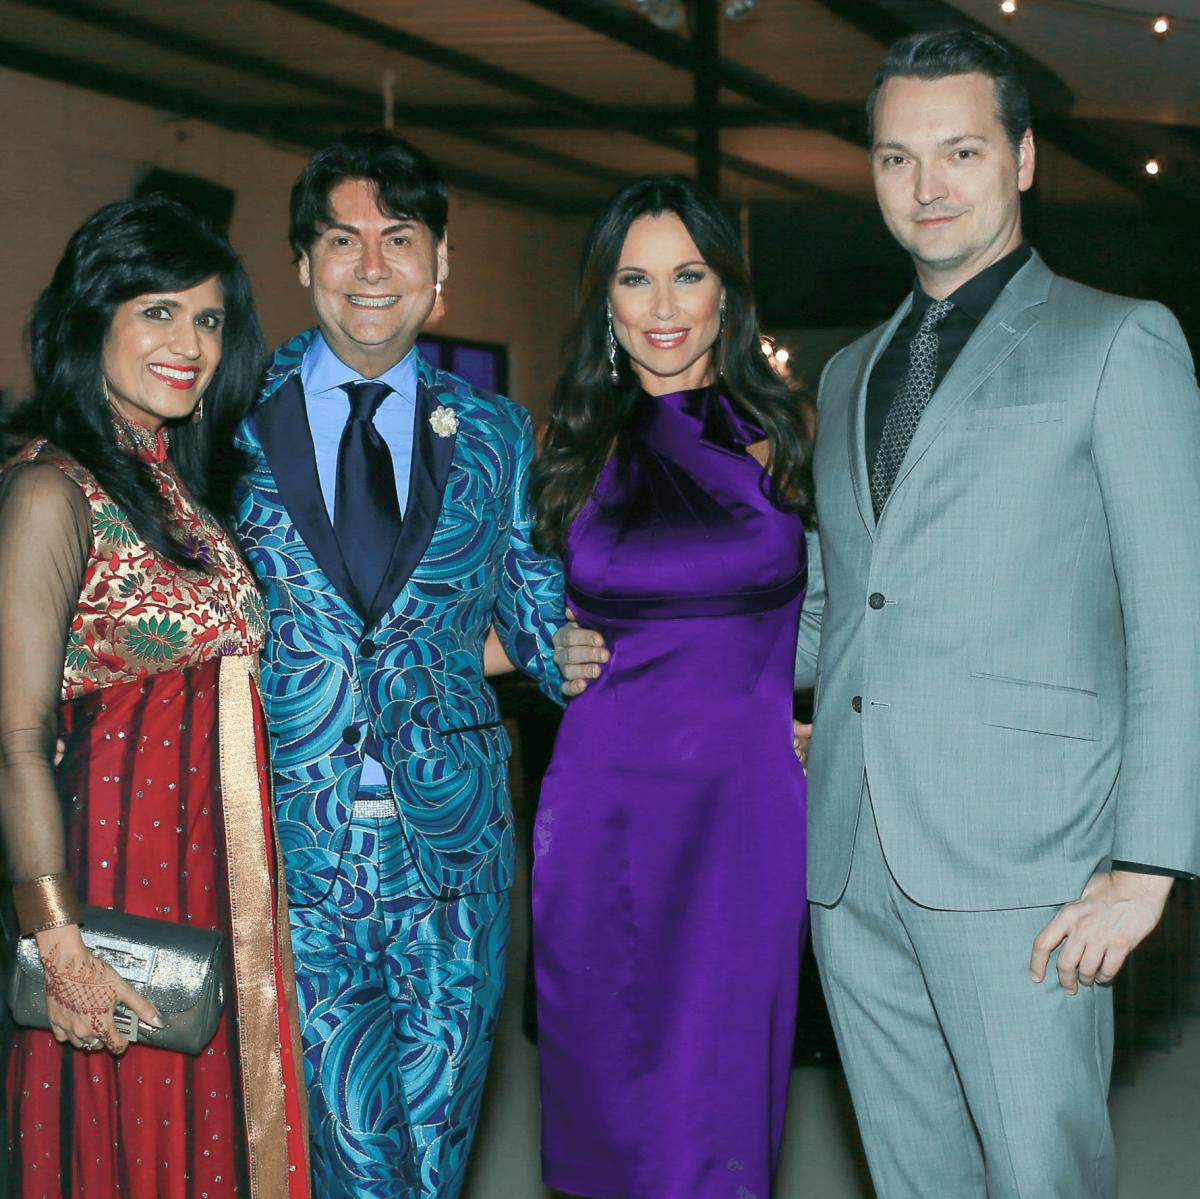 Ruby Bhandari, emcee Steve Kemble, LeeAnne Locken, Chad  Collom